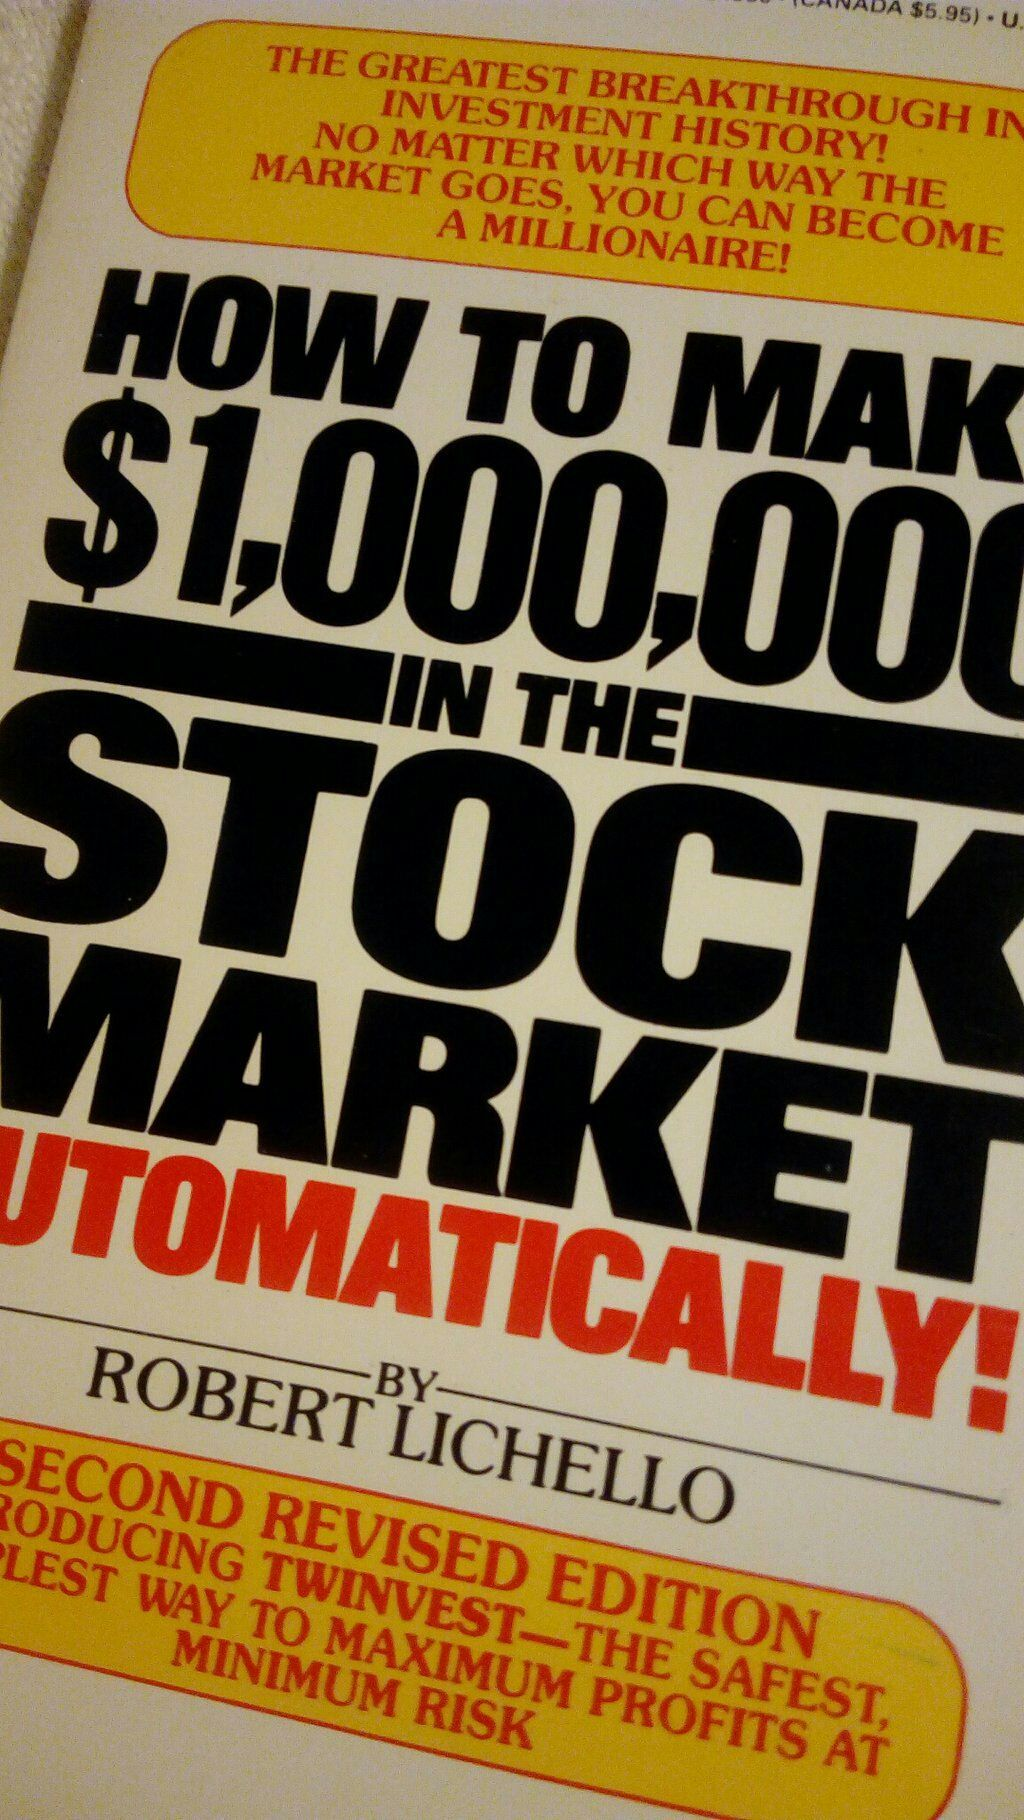 How to Make 1,000,000 in the Stock Market Automatically! de Robert Lichello